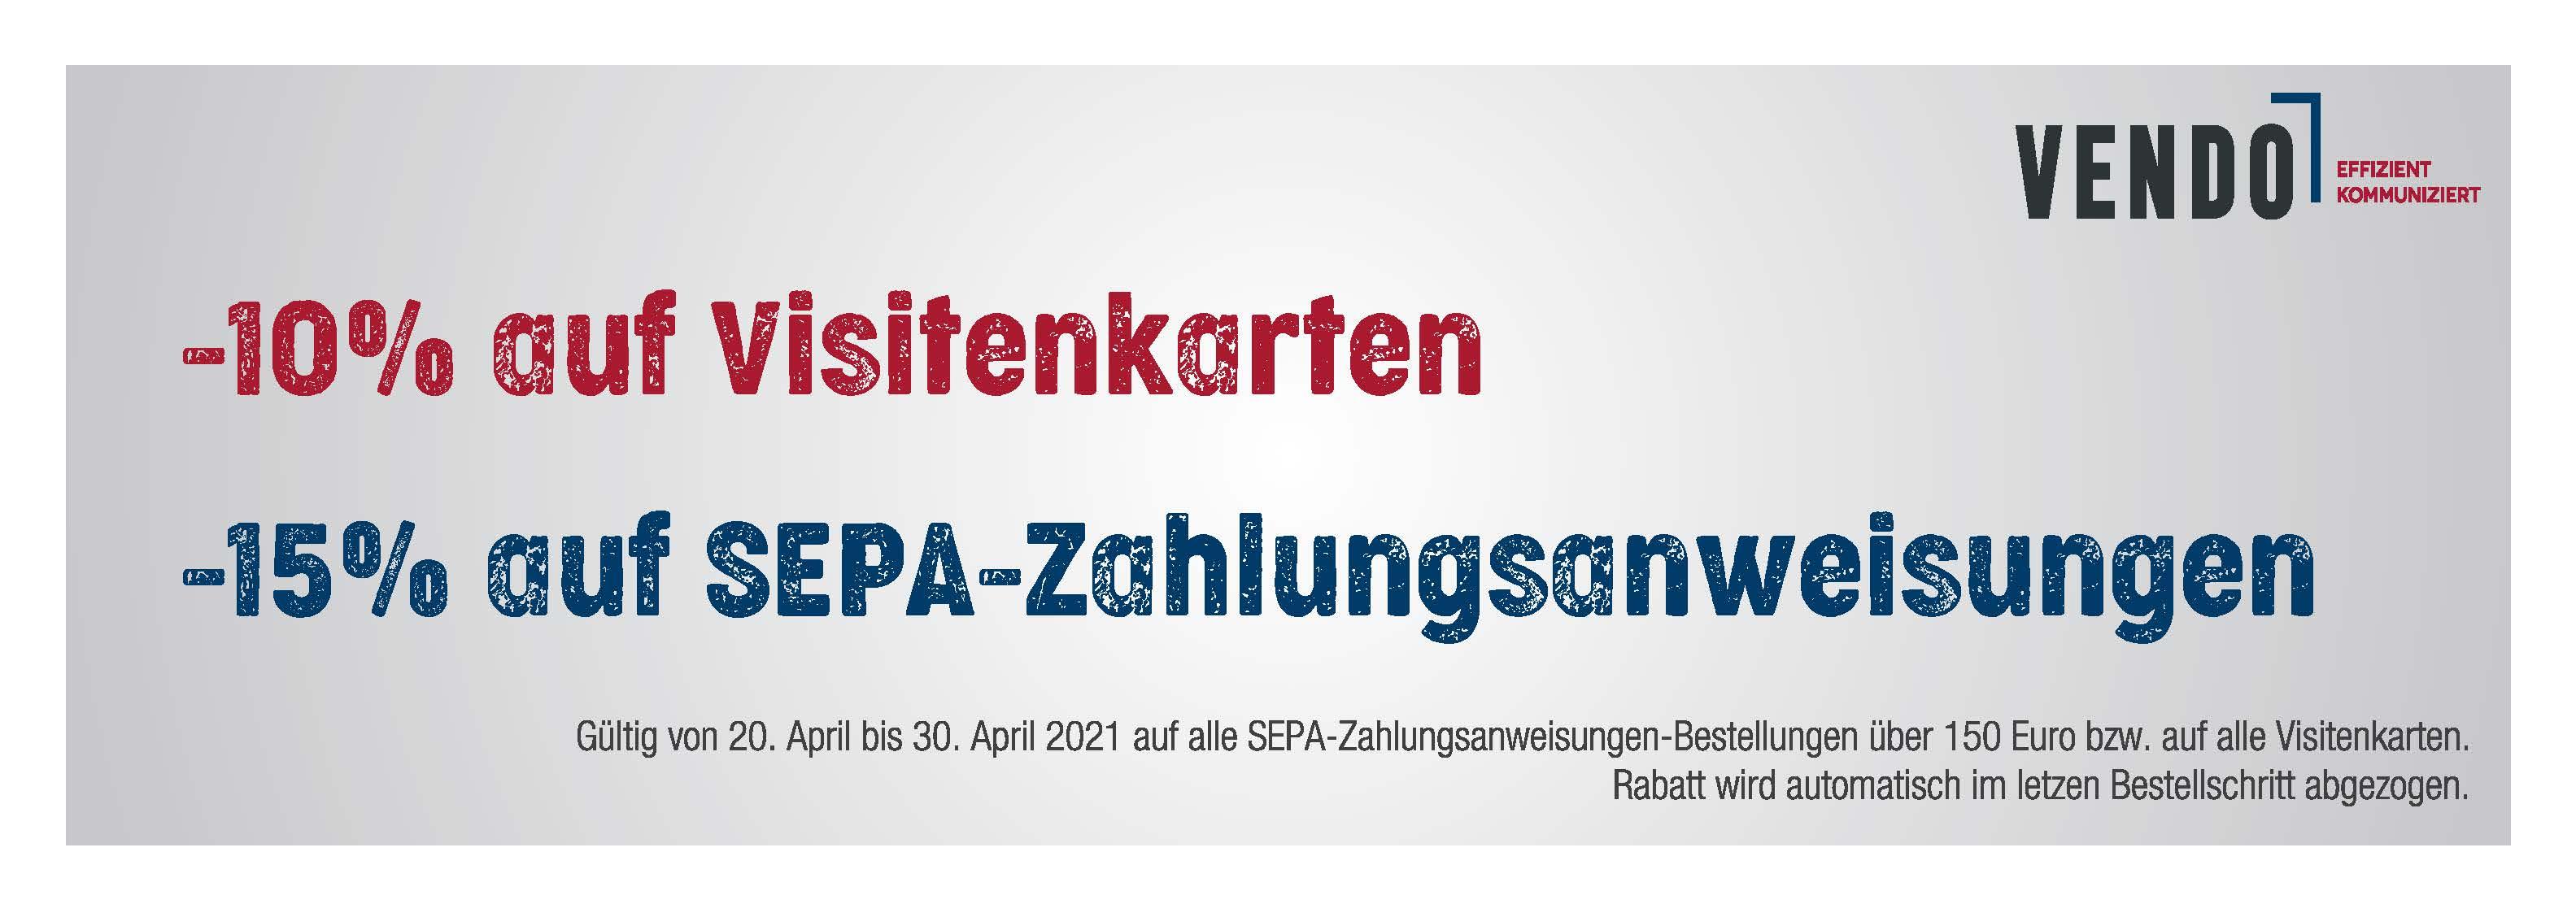 Achtung! April-Rabatt-Aktion!